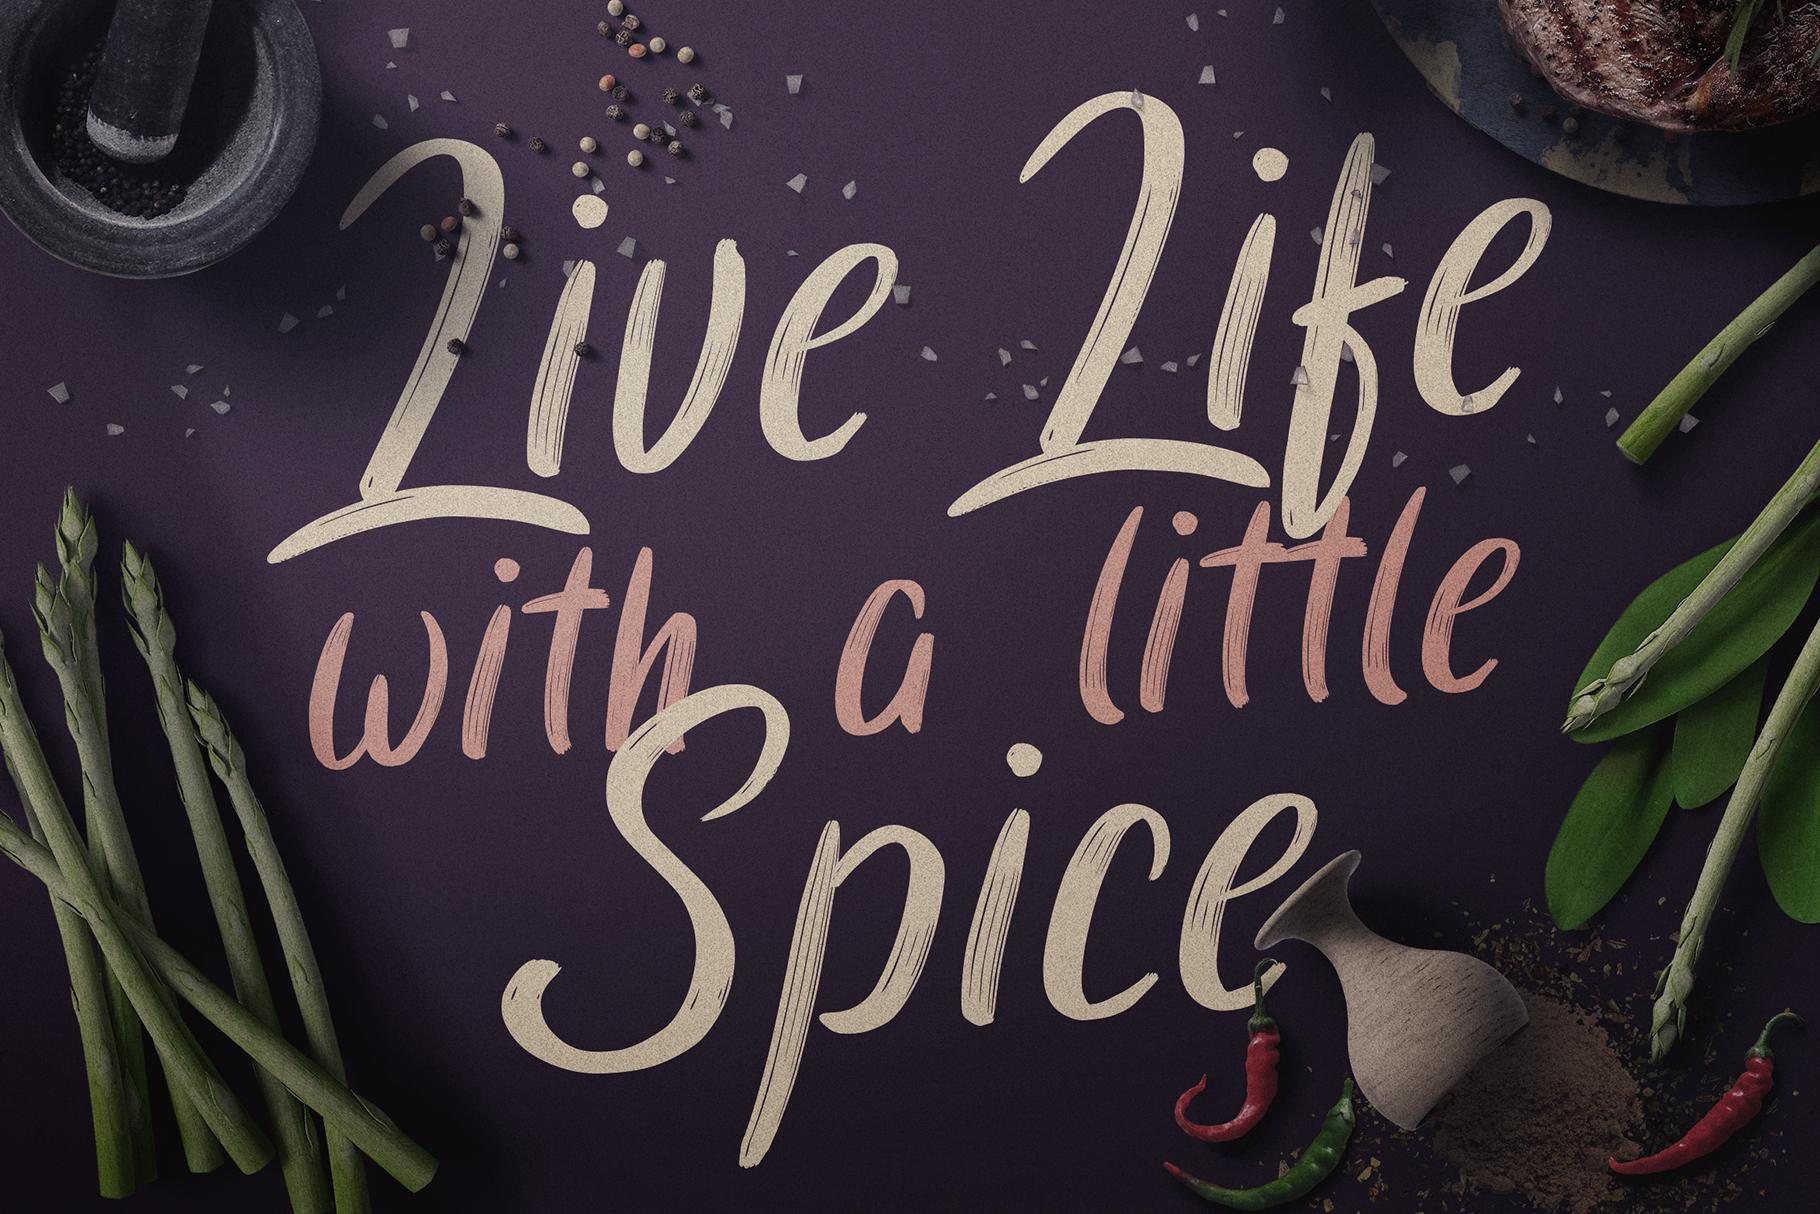 Spicy Taste example image 4